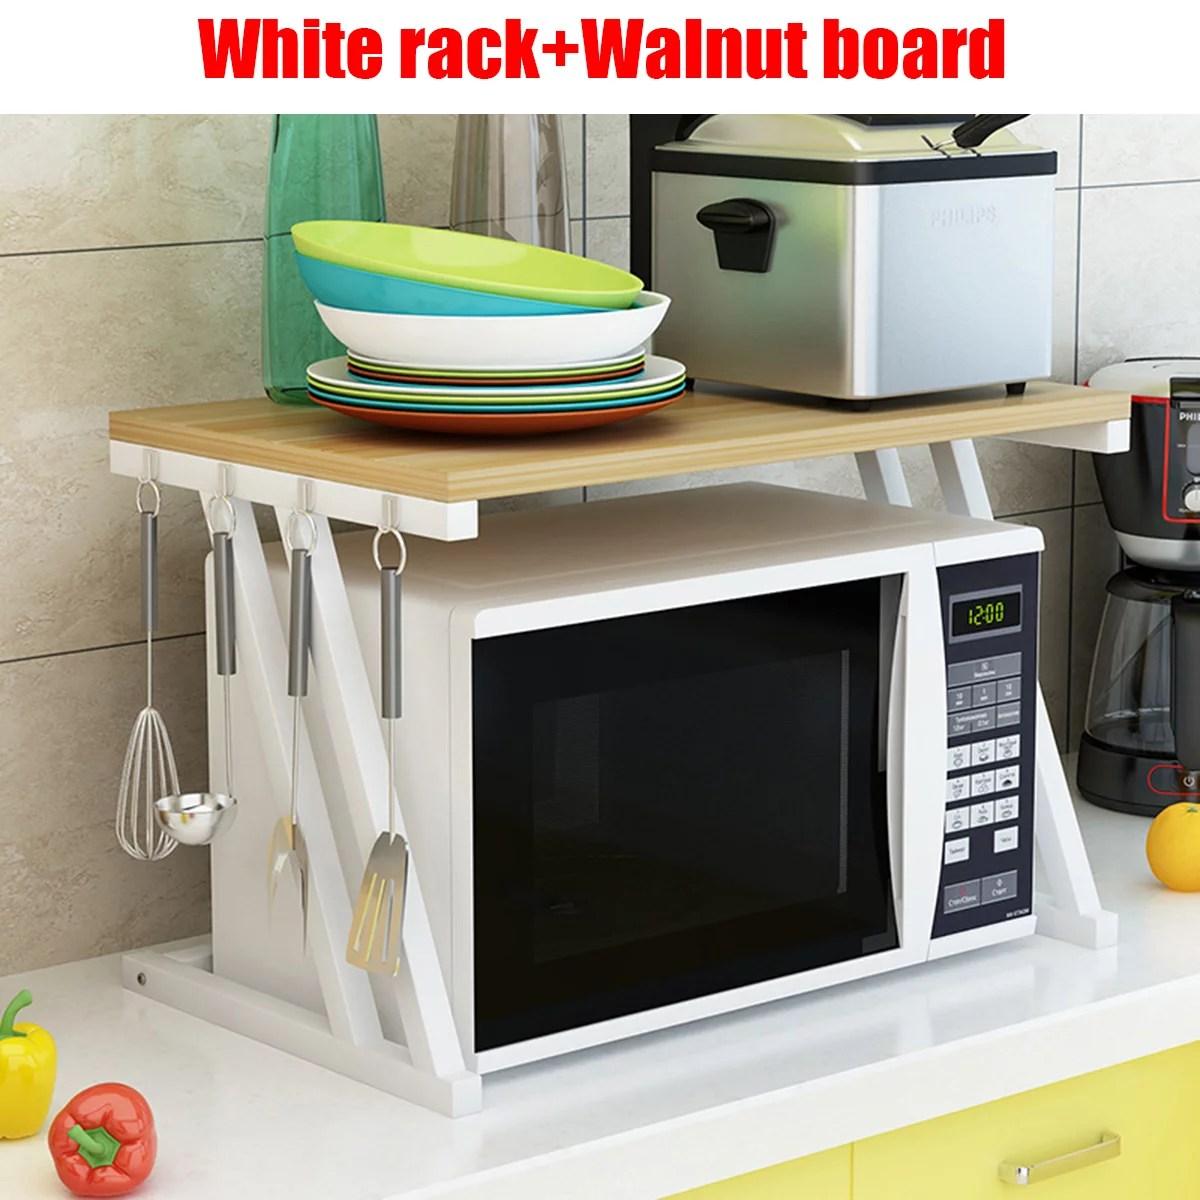 2 tiers 22 x 15 x 15 modern multi functional display walnut bakers rack microwave stand rolling kitchen storage steel rack wood board